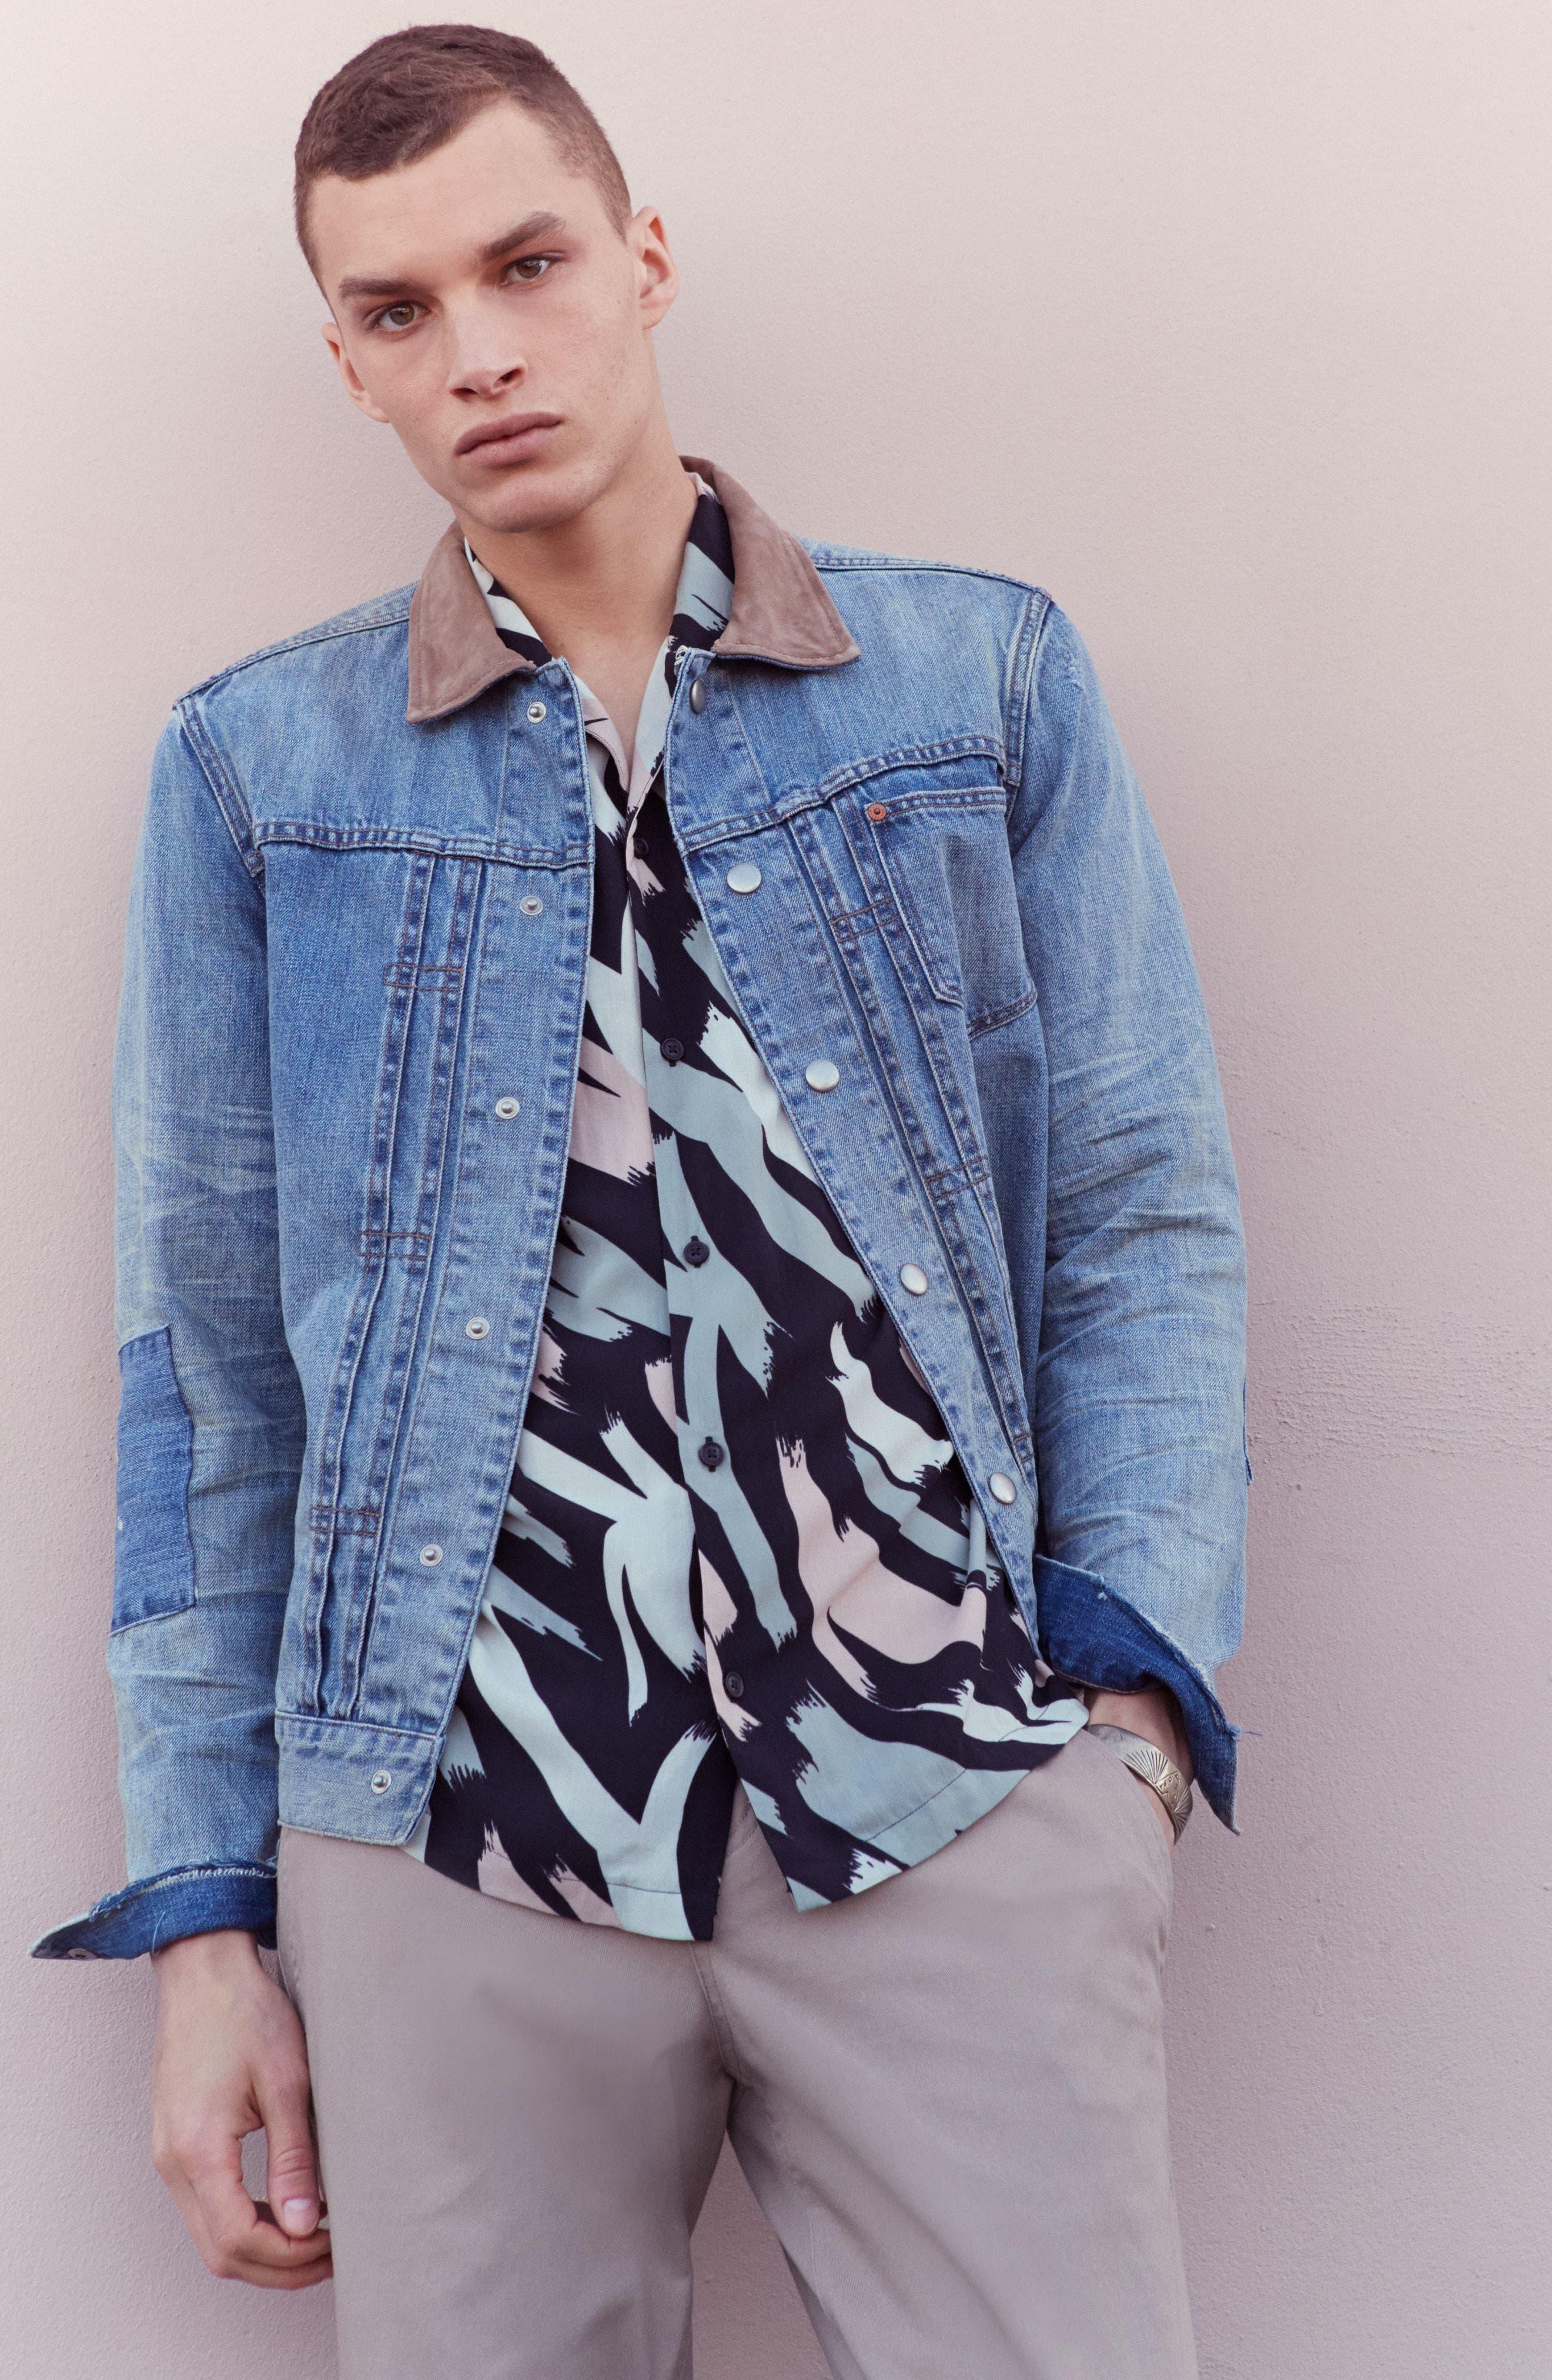 Ibanex Slim Fit Distressed Denim Jacket,                             Alternate thumbnail 5, color,